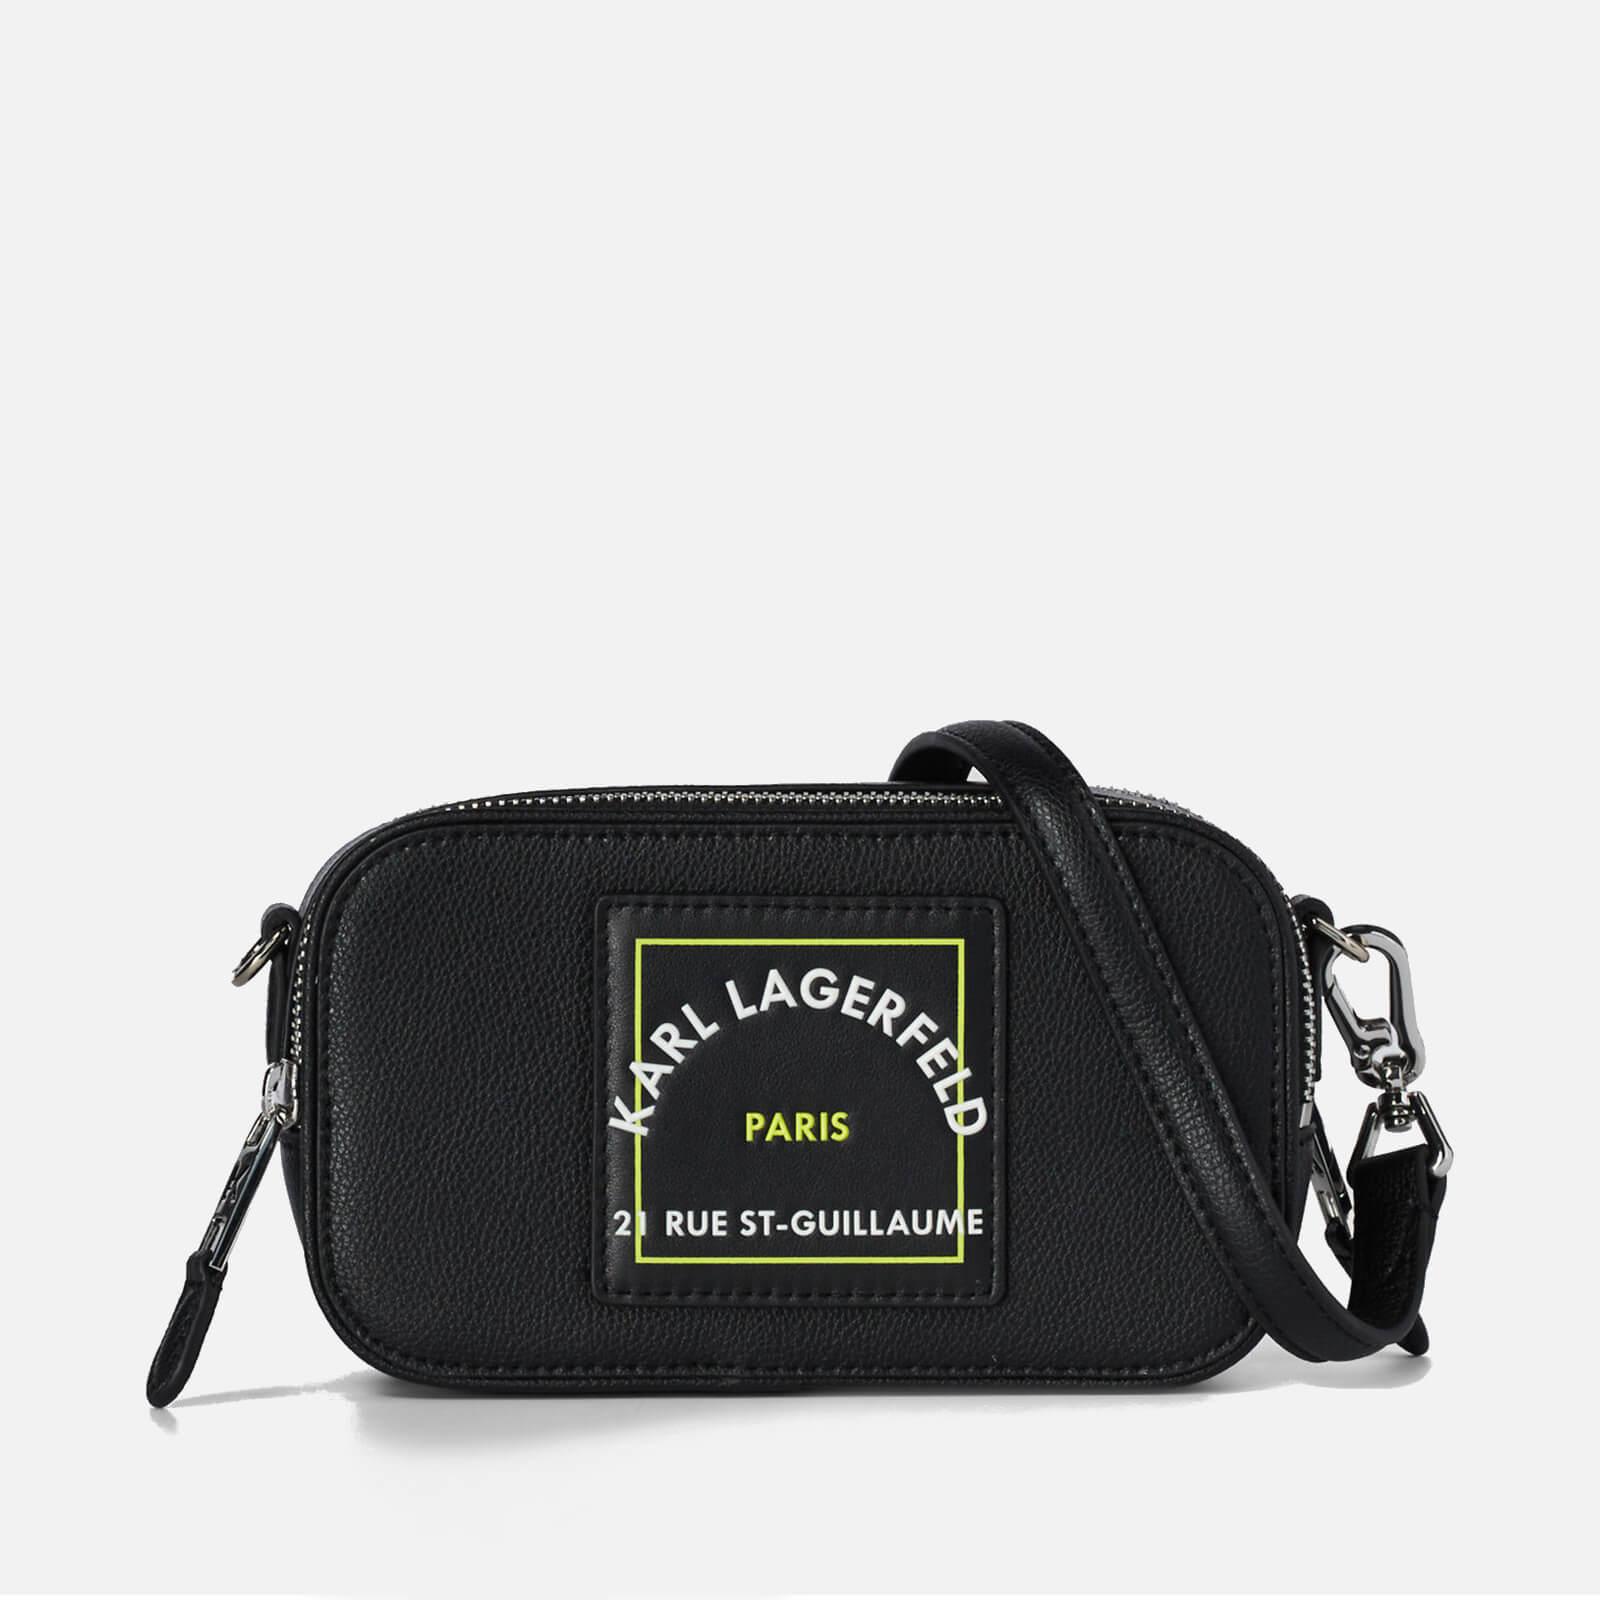 KARL LAGERFELD Women's Rsg Patch Camera Bag - Black